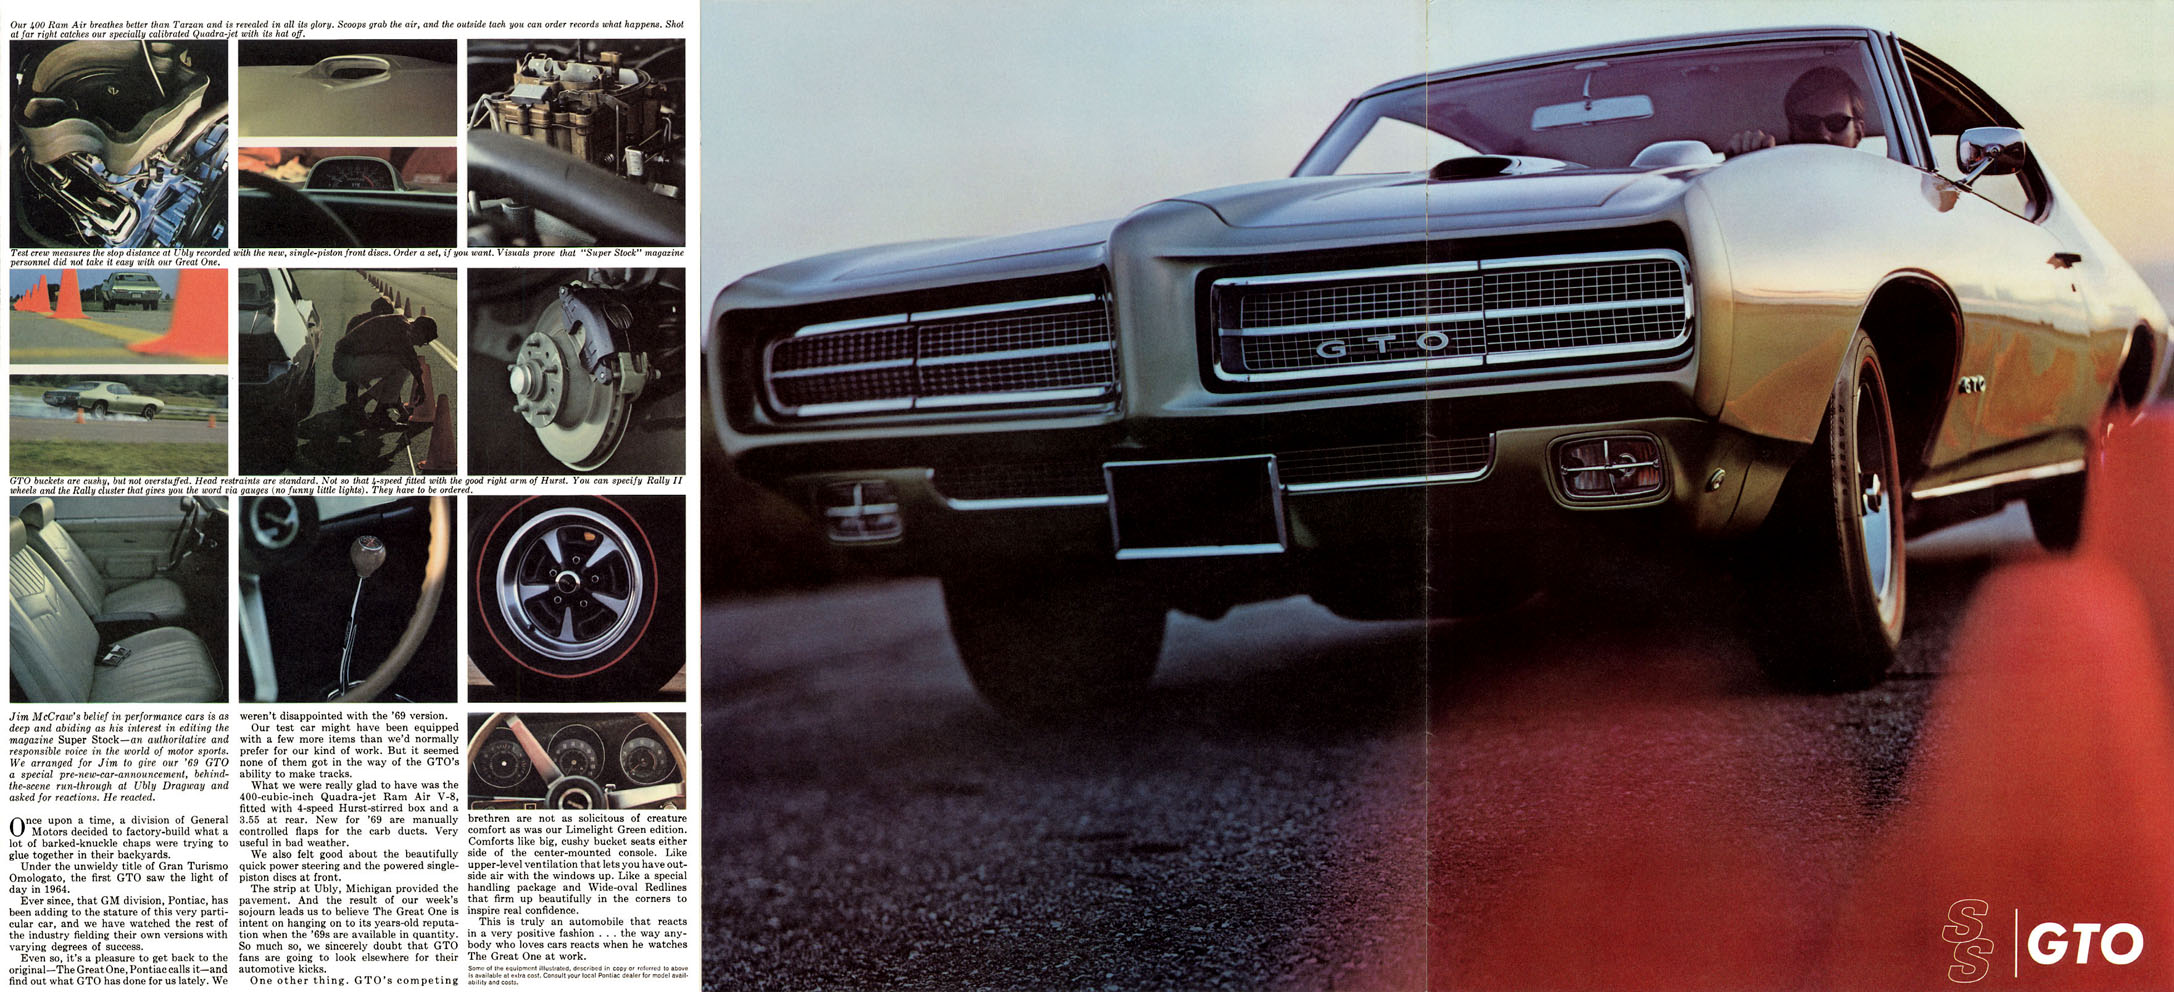 TunnelRam_GTO (40).jpg